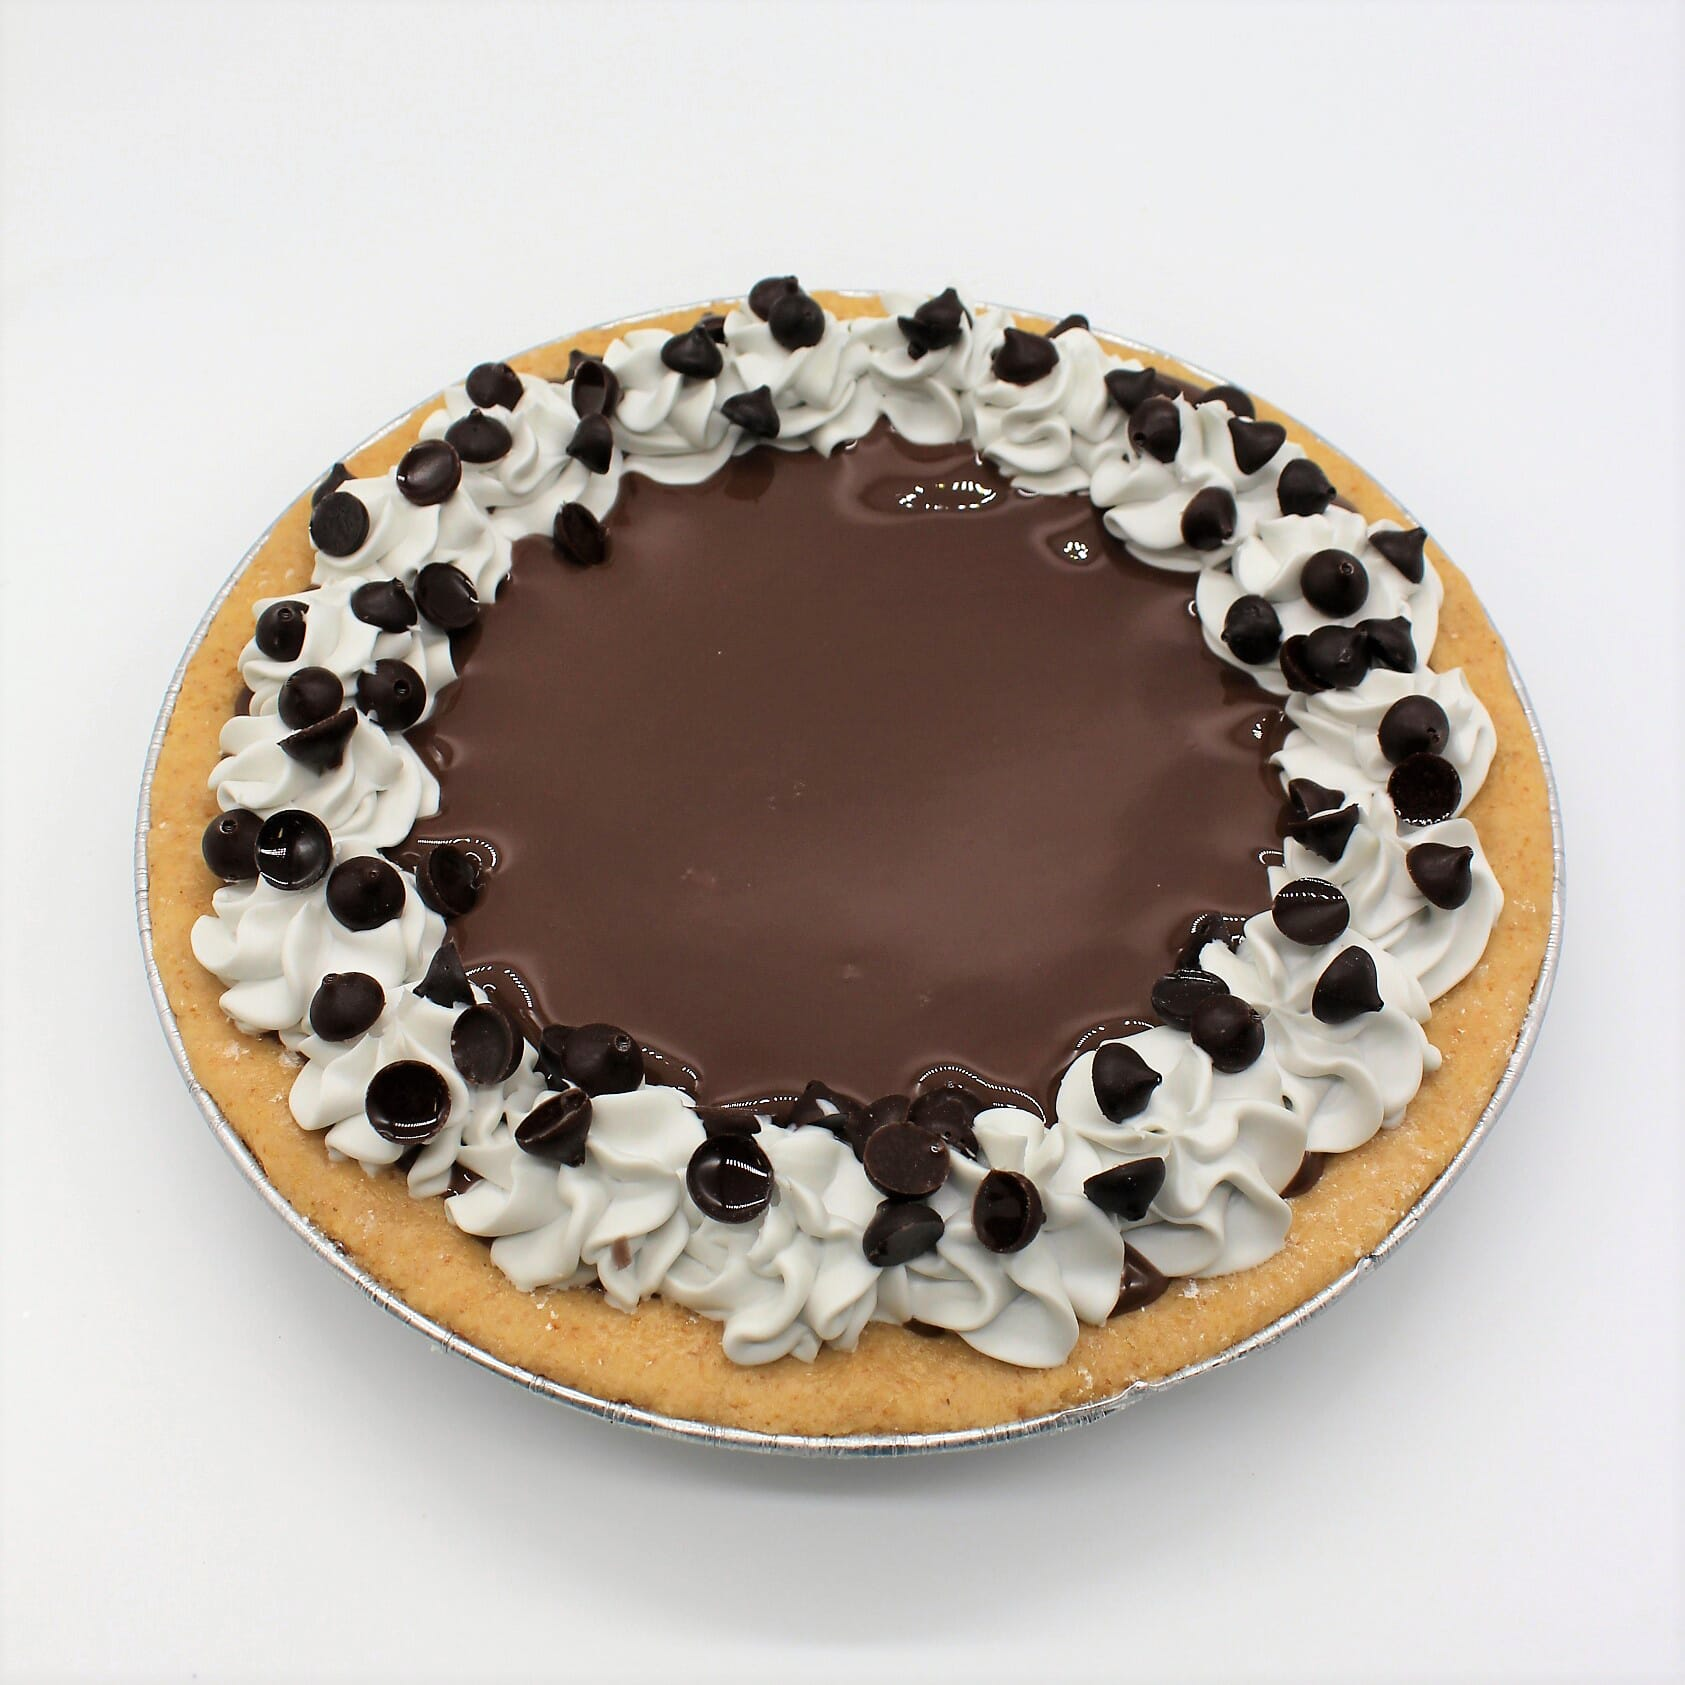 "Fake 9"" Chocolate Cream Pie"